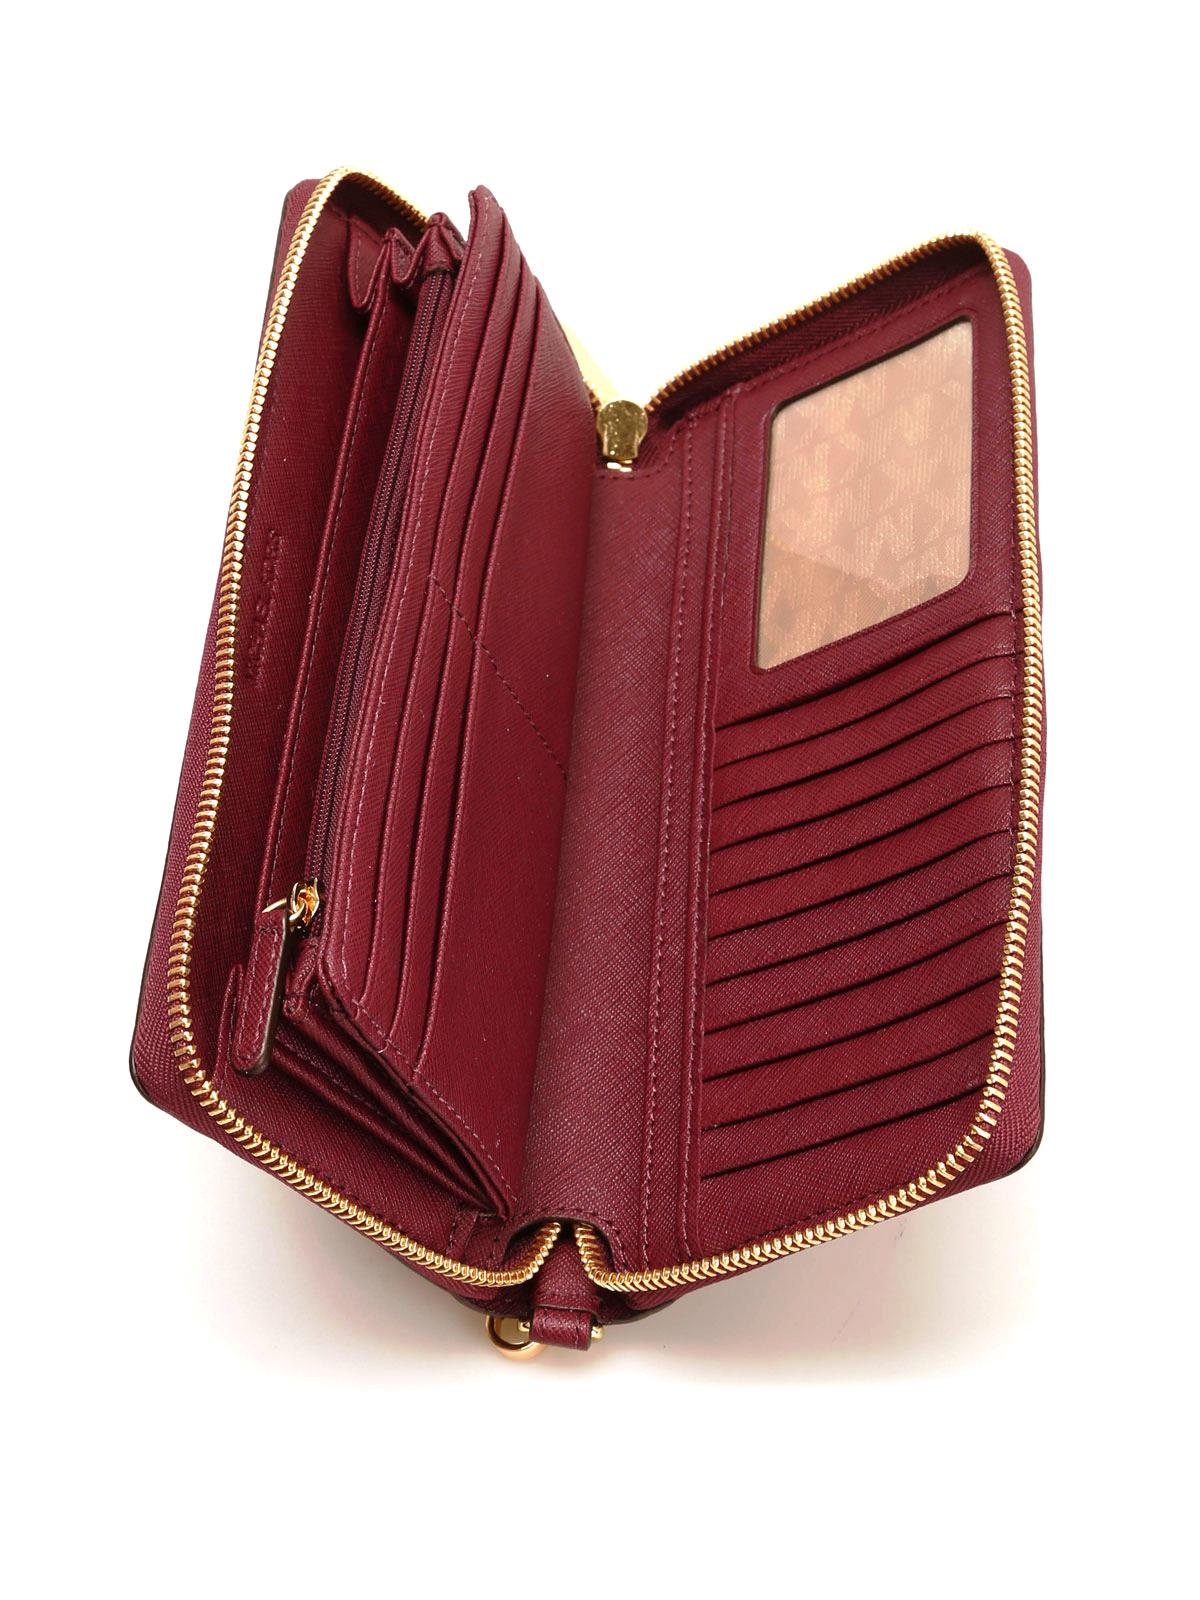 Michael Kors Jet Set Travel Käsilaukku : Jet set travel wallet by michael kors wallets purses